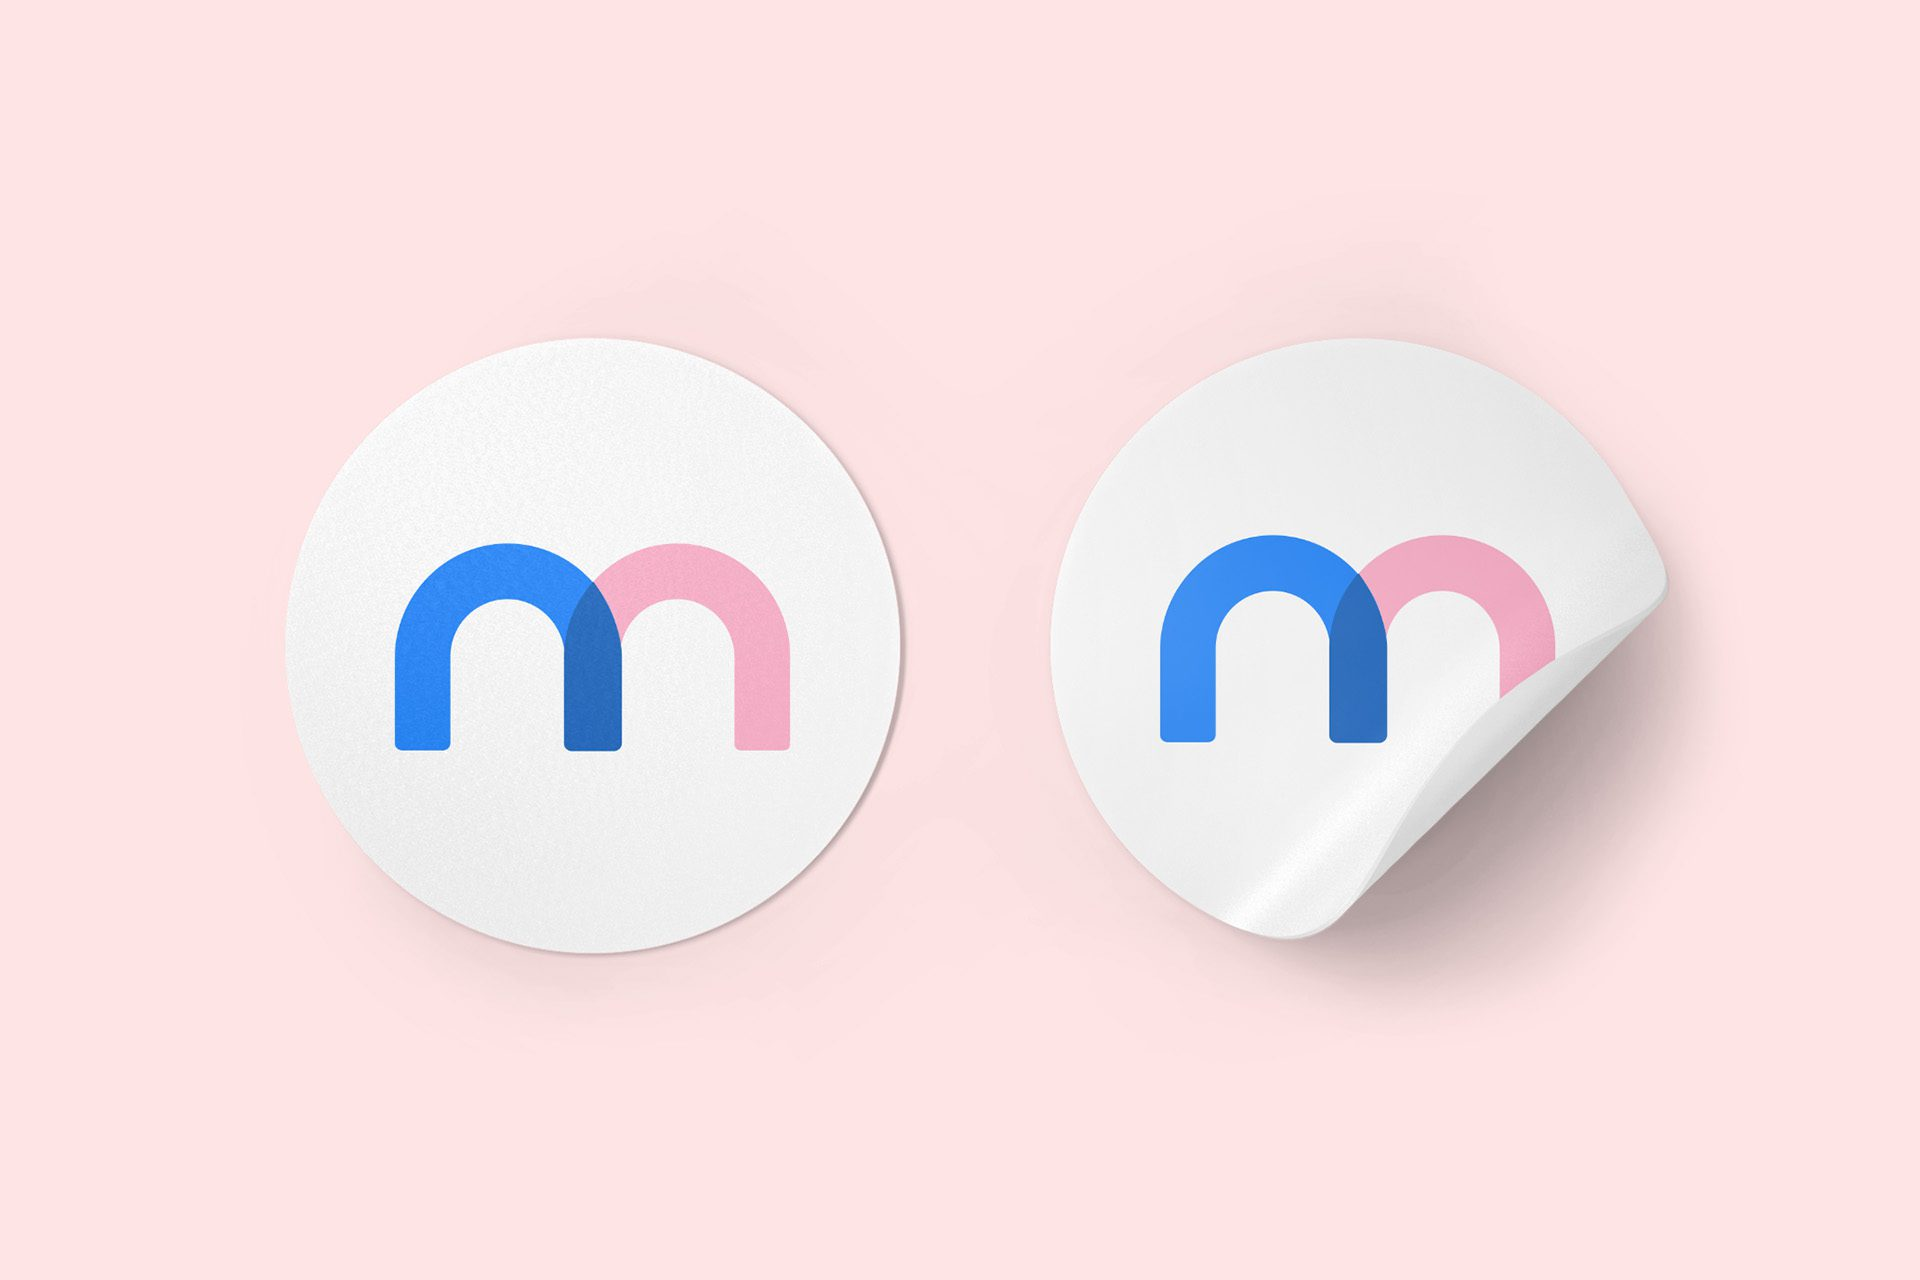 sticker-mockup-templates